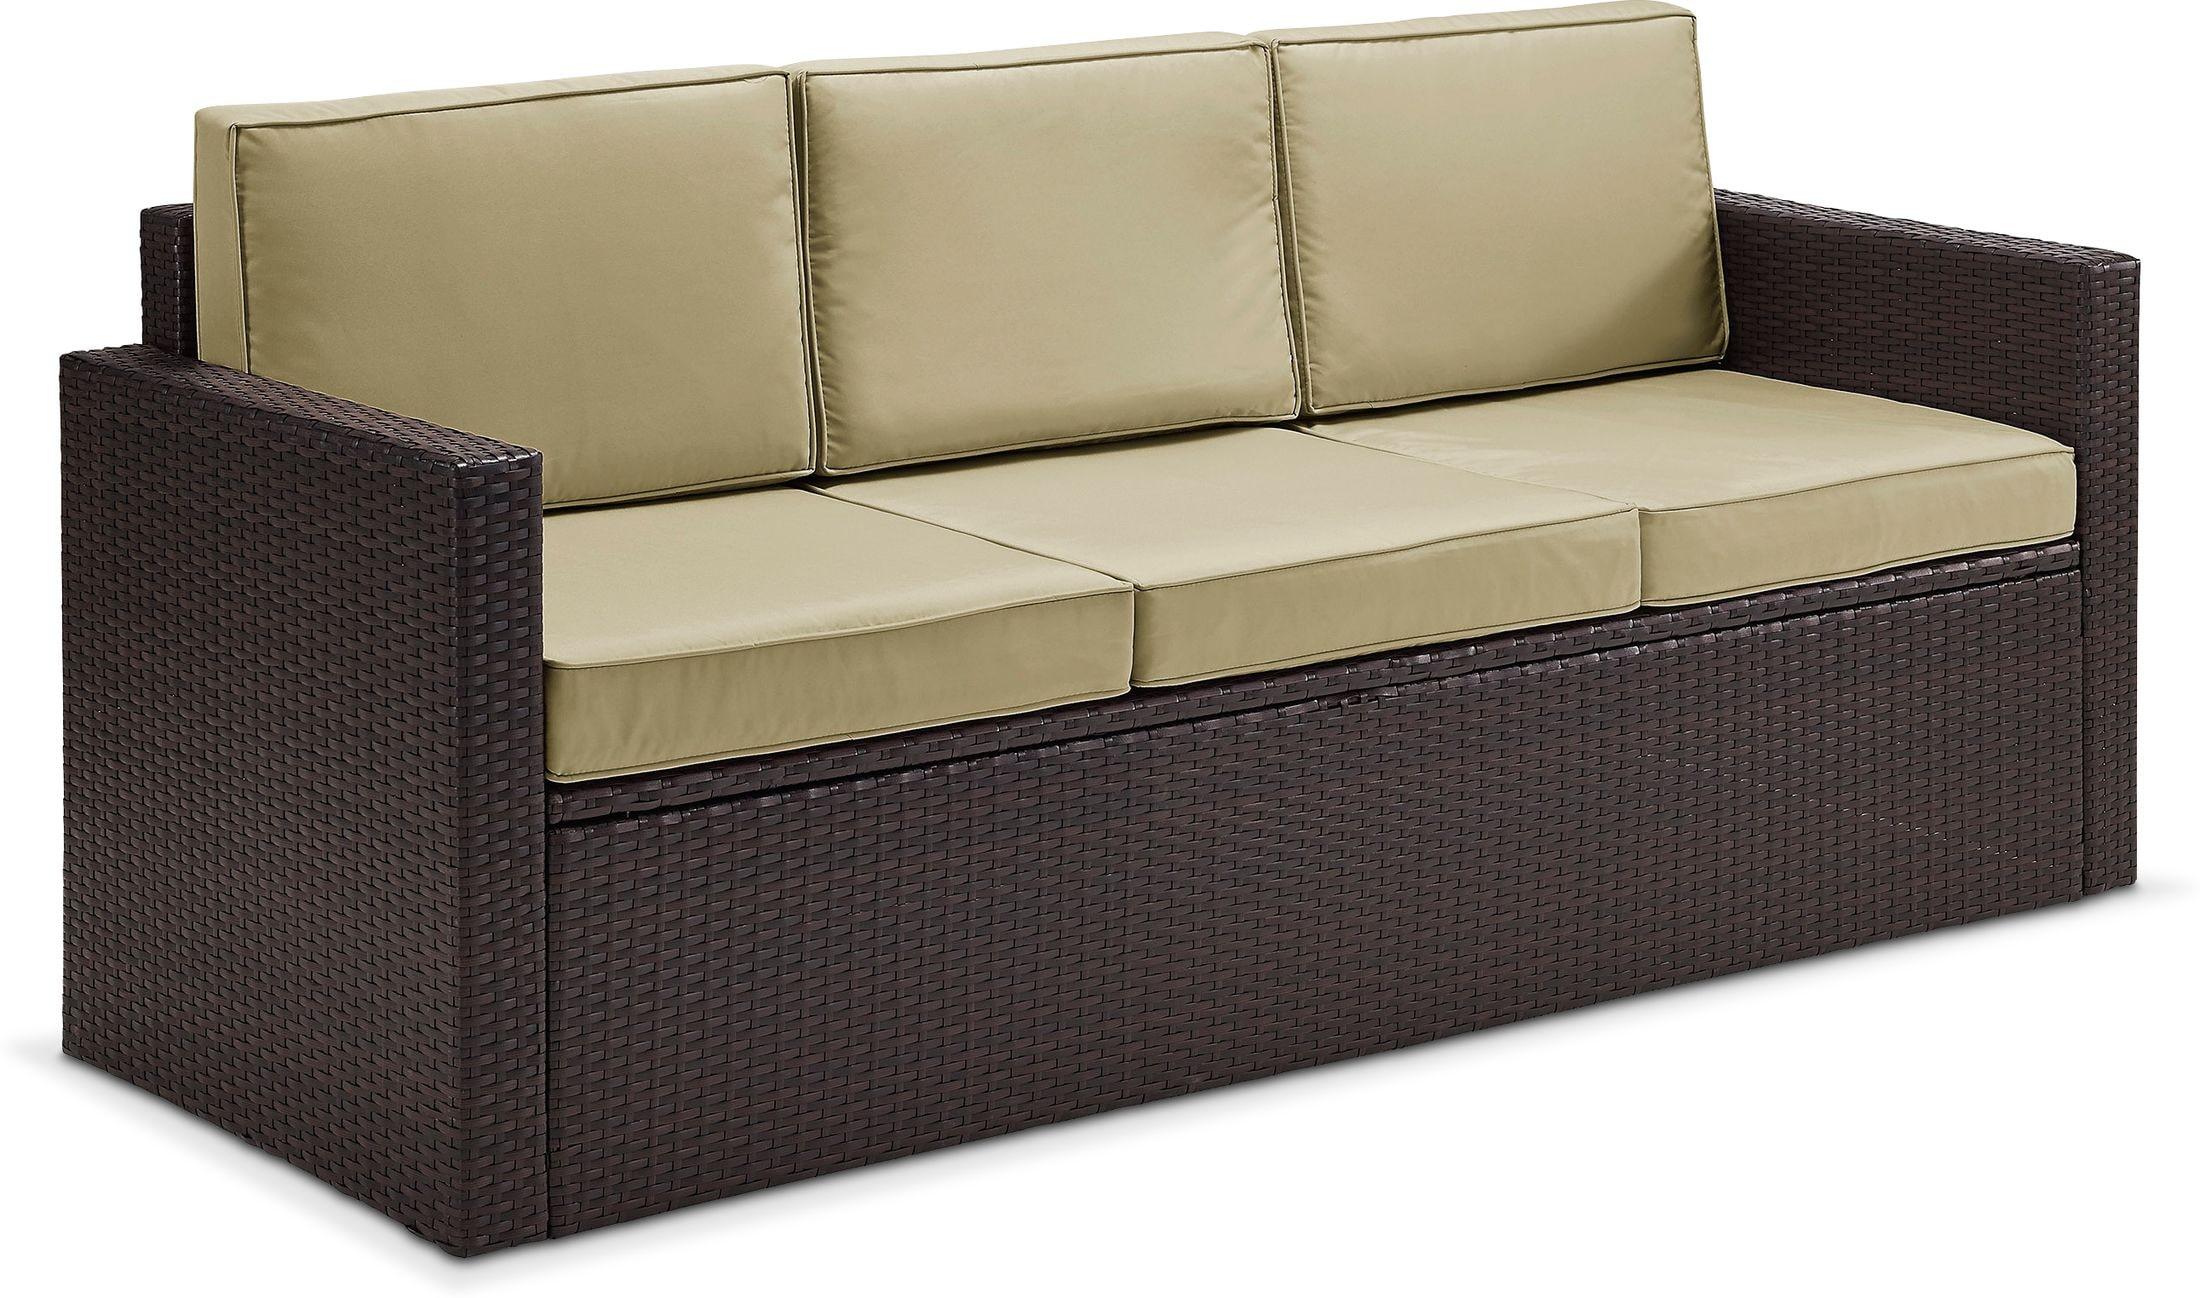 Outdoor Furniture - Aldo Outdoor Sofa